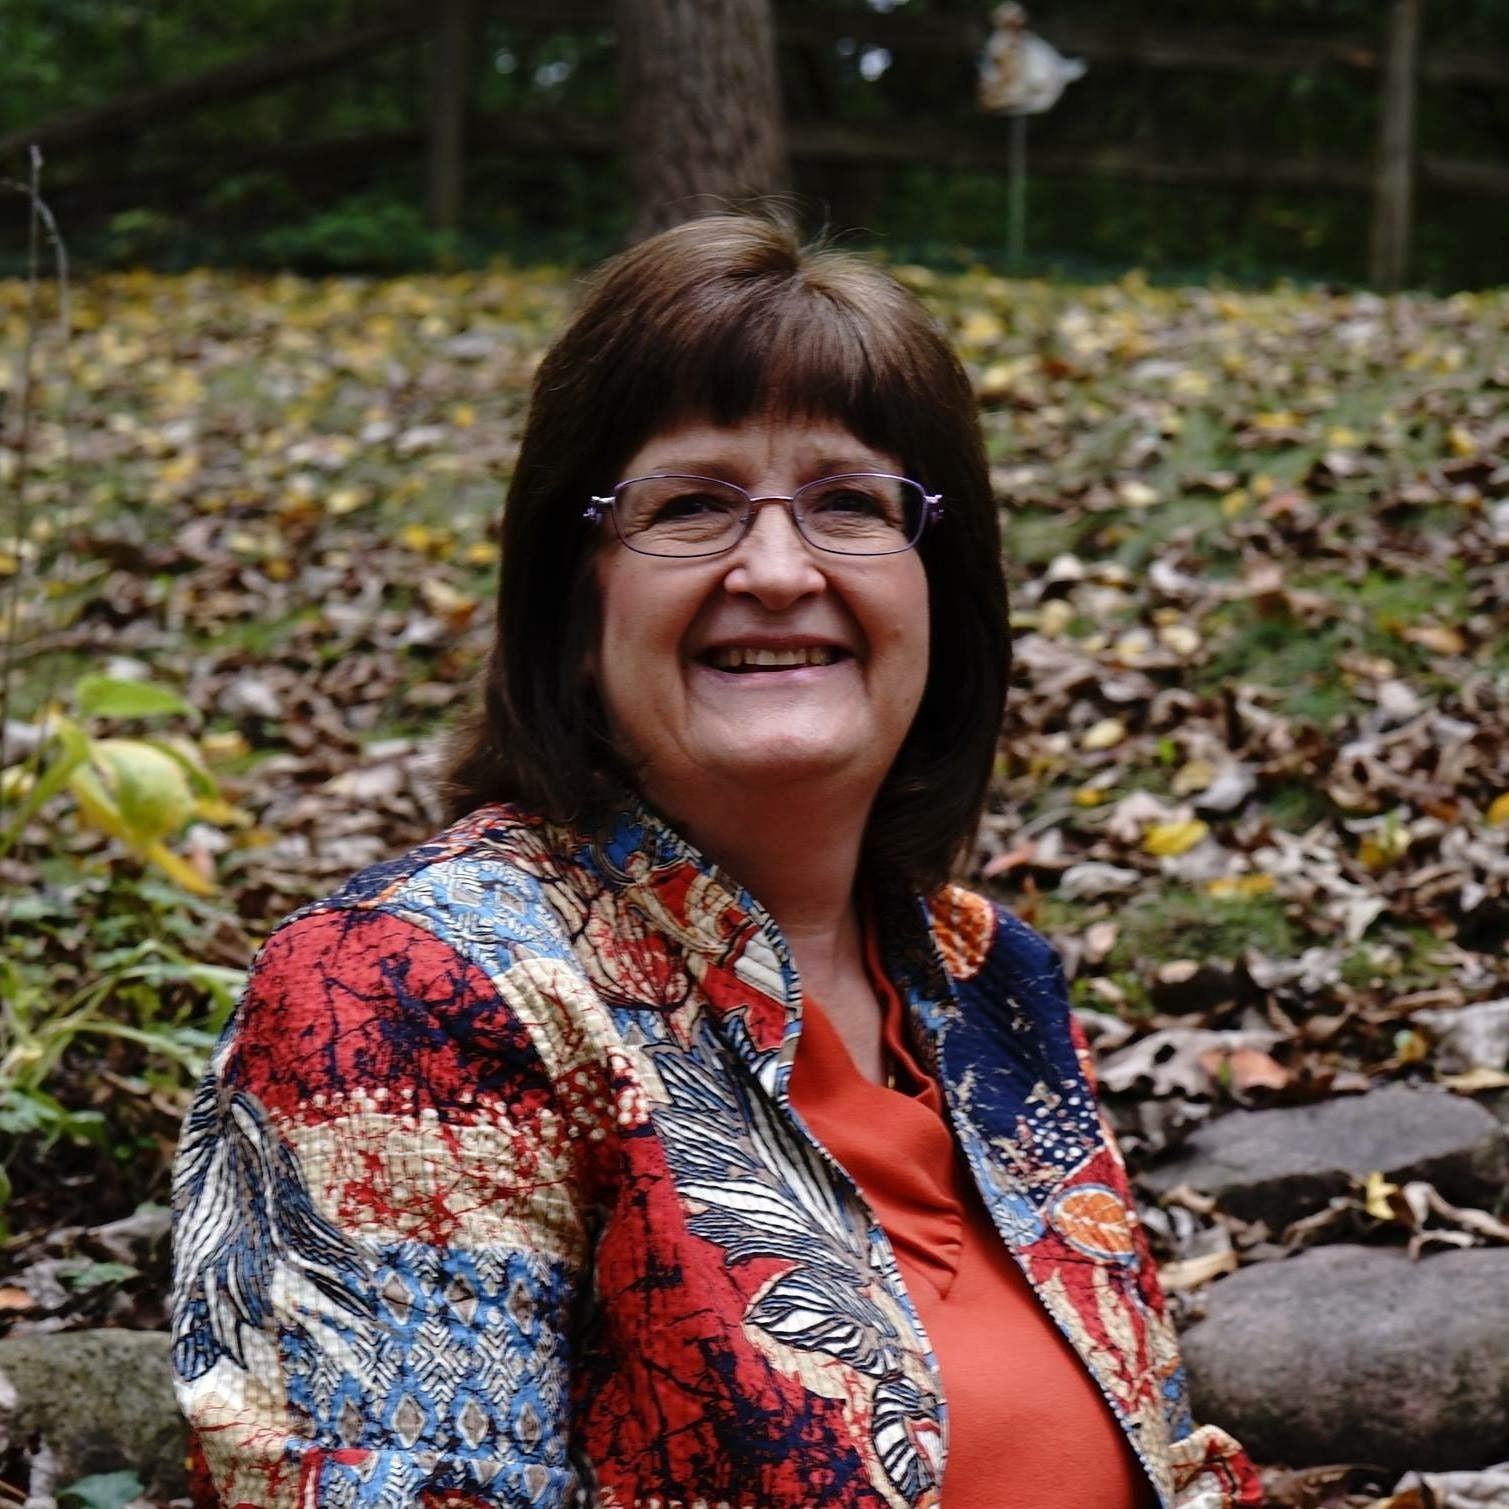 Go to Joyce Konstantinow's profile